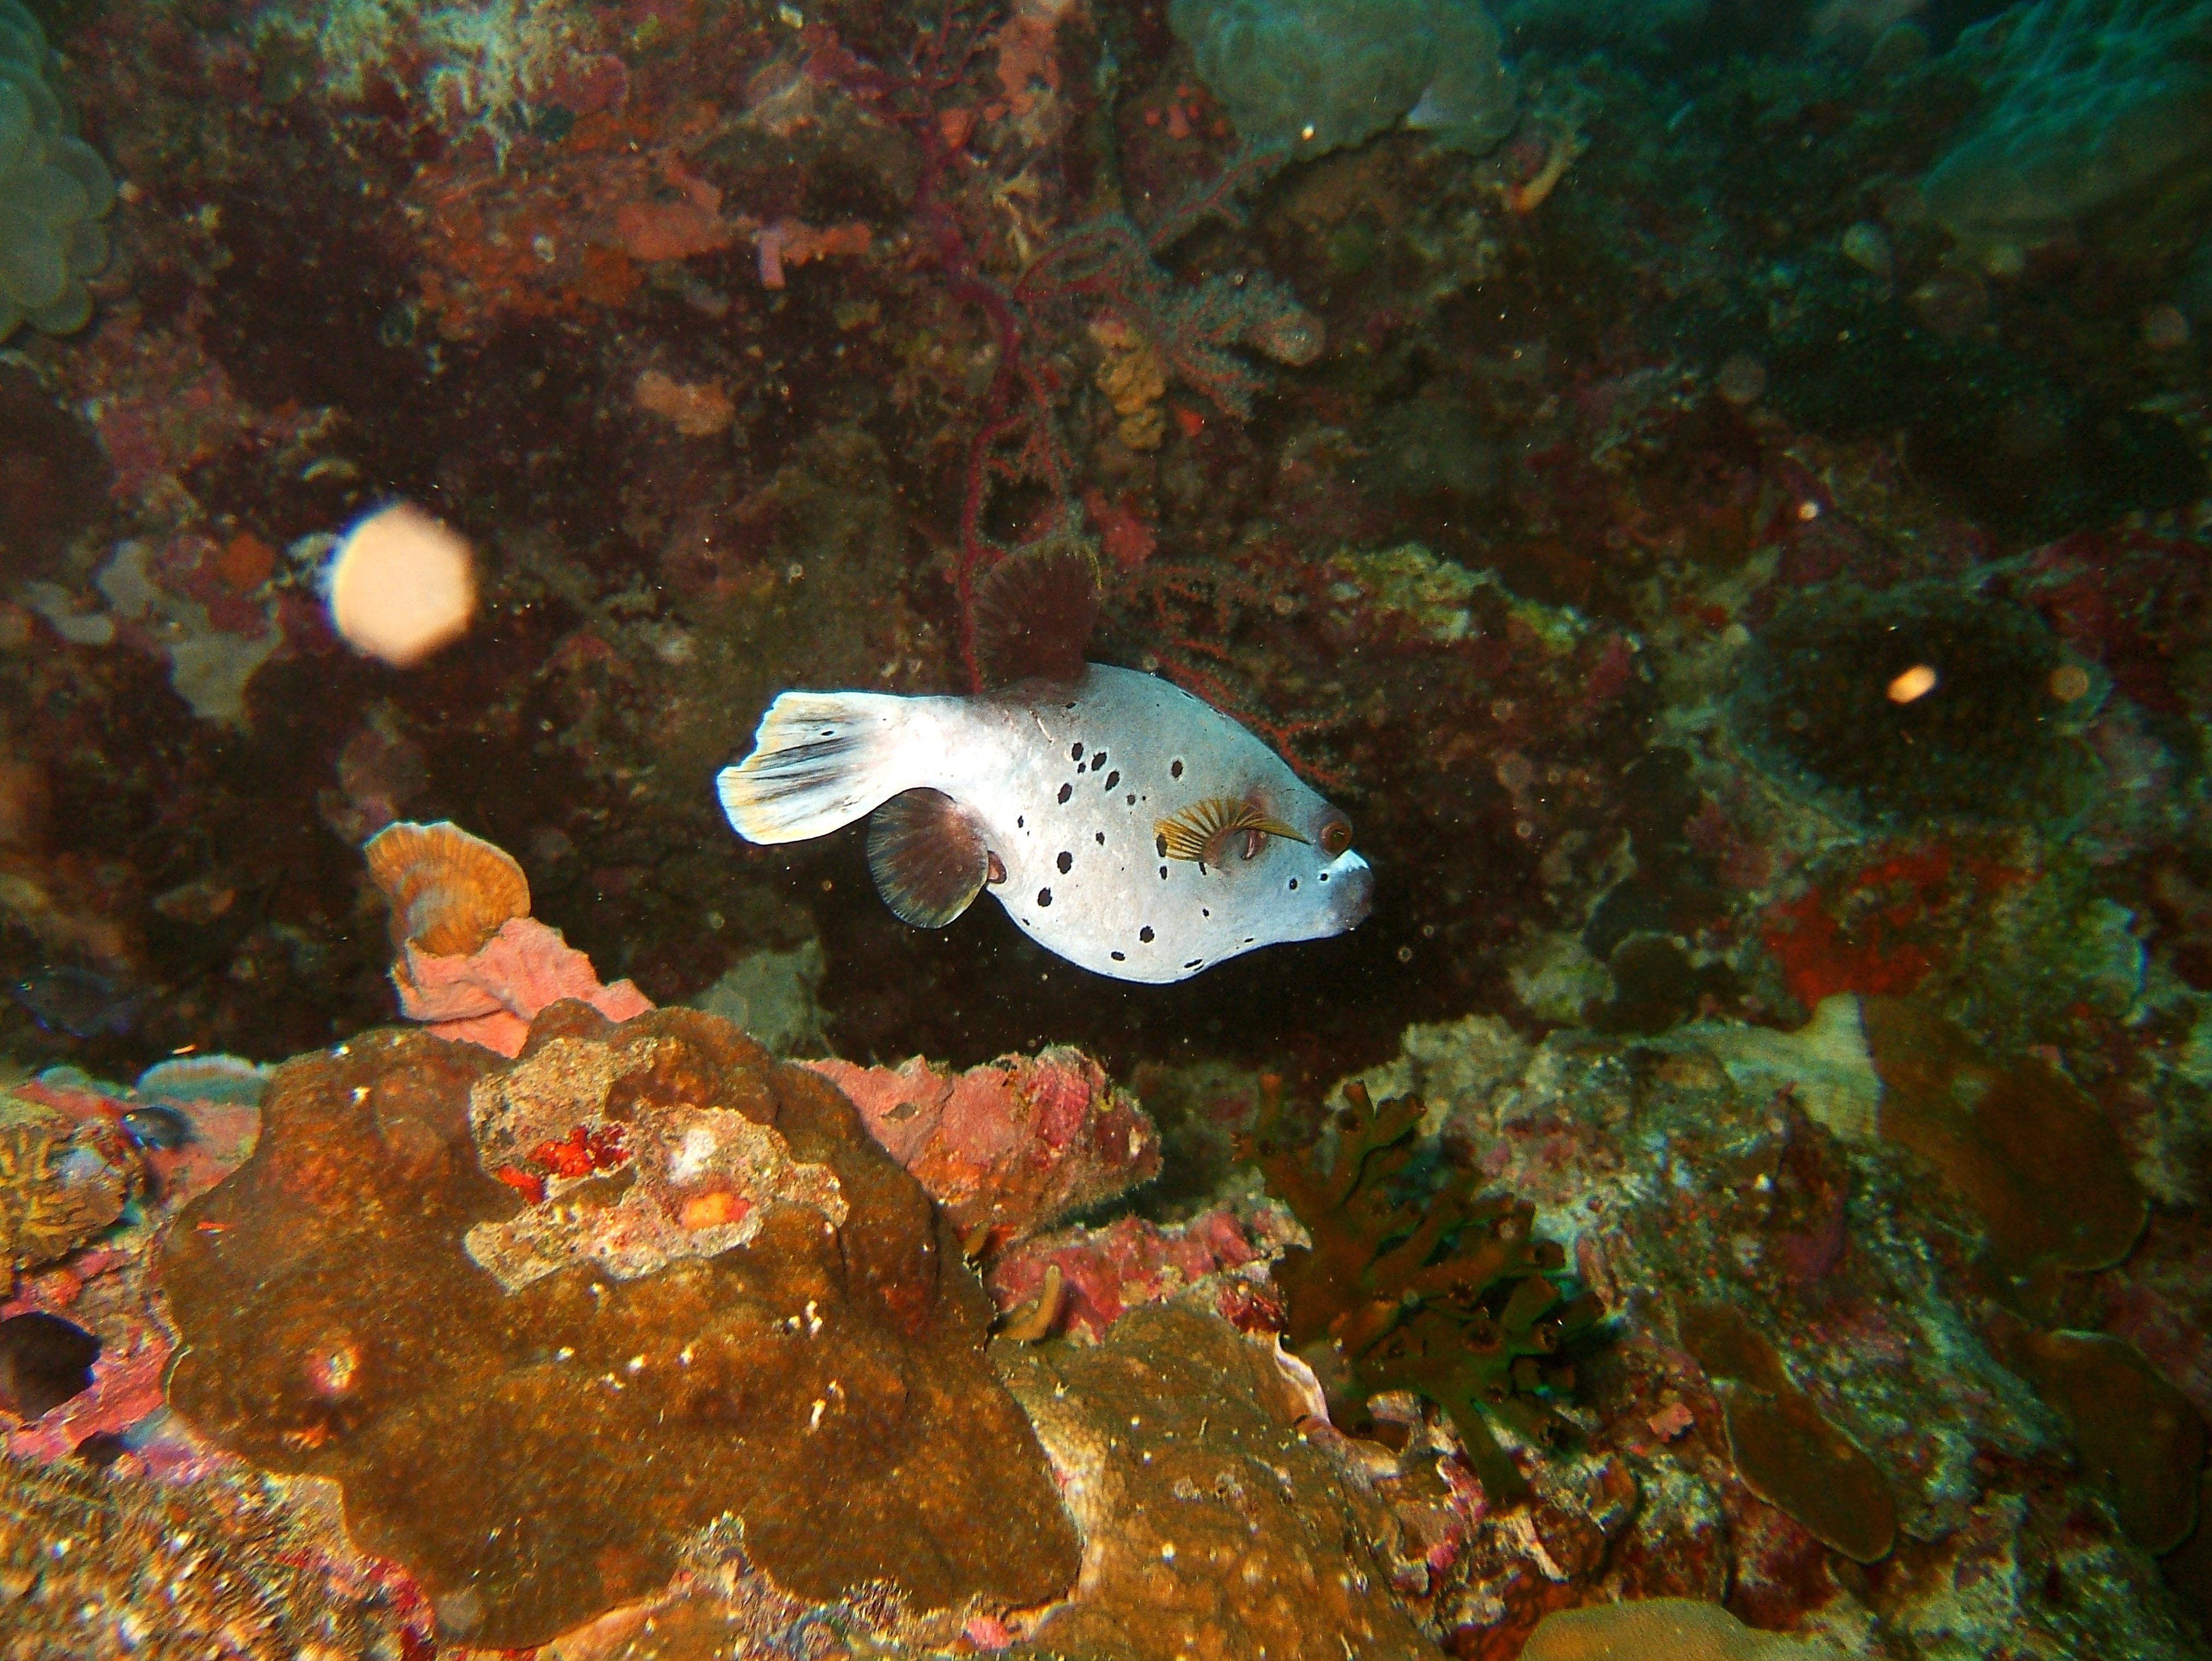 Philippines Cebu Moal Boal 20051226 Dive 1 Kasai Point 21